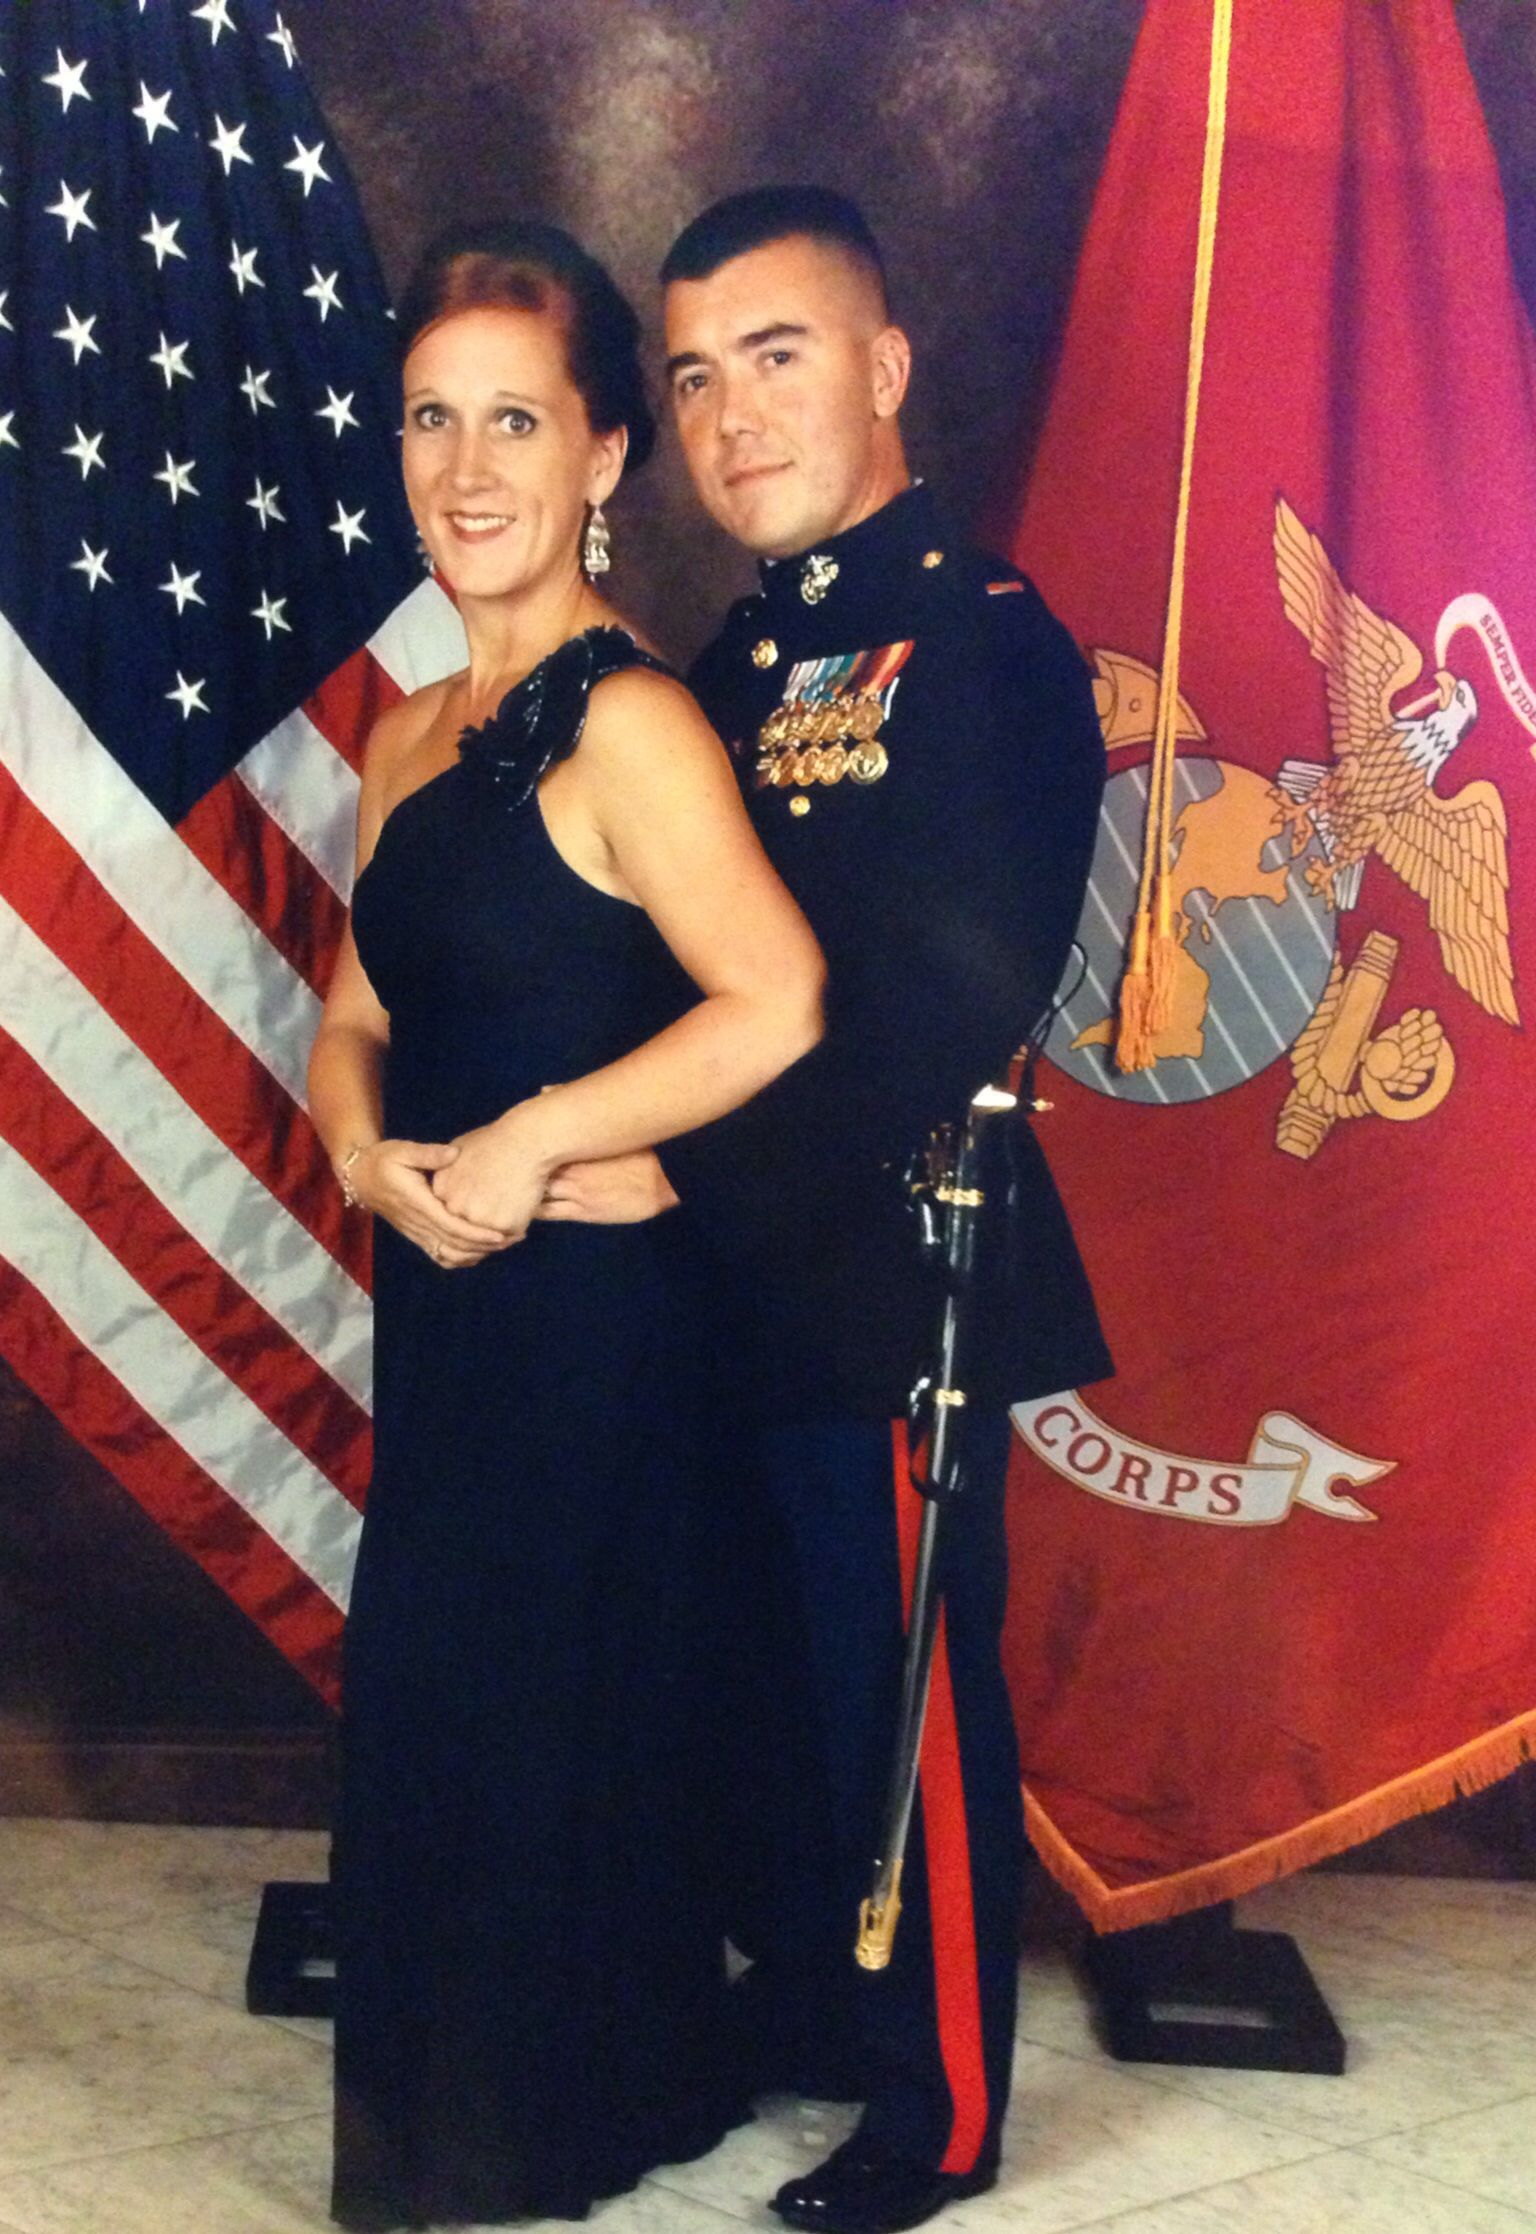 Marine Corps Birthday Ball haha cute pics to capture the